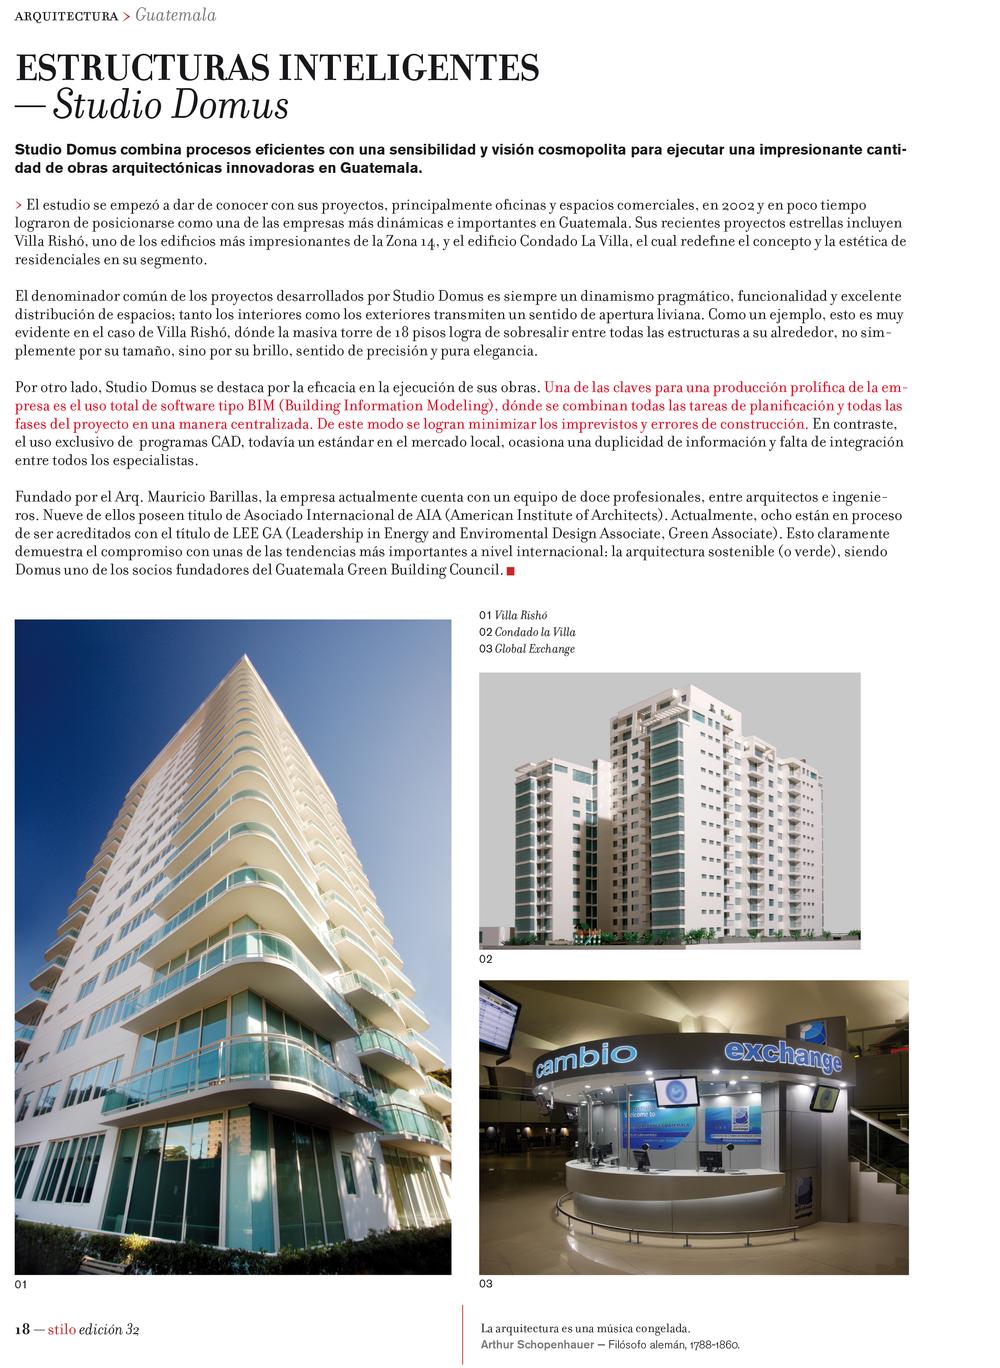 2010 Articulo Revista Stilo 32 1.jpg